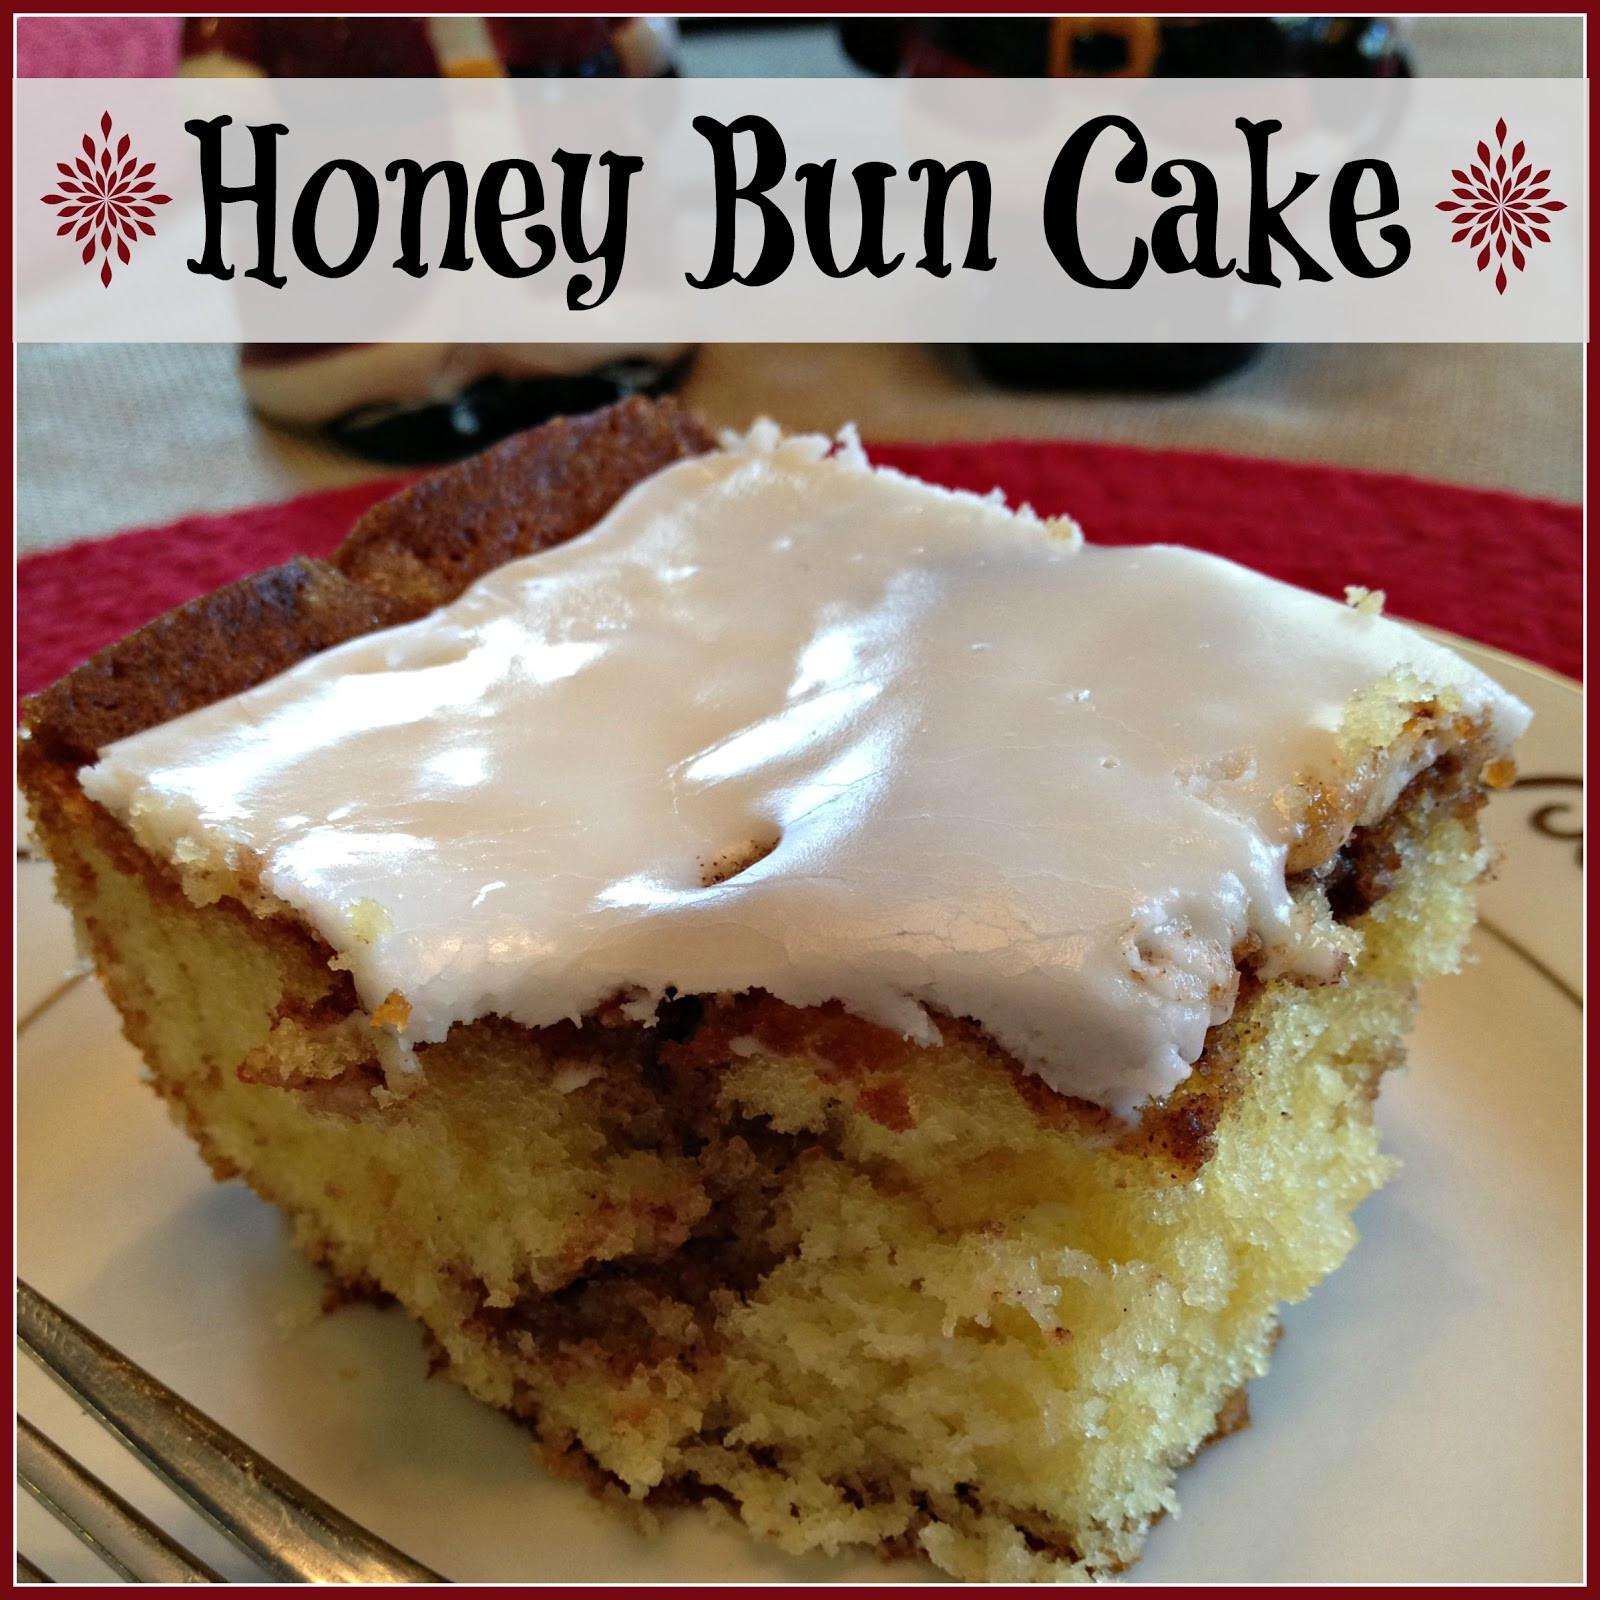 Recipe For Honeybun Cake  Crafty in Crosby Honey Bun Cake